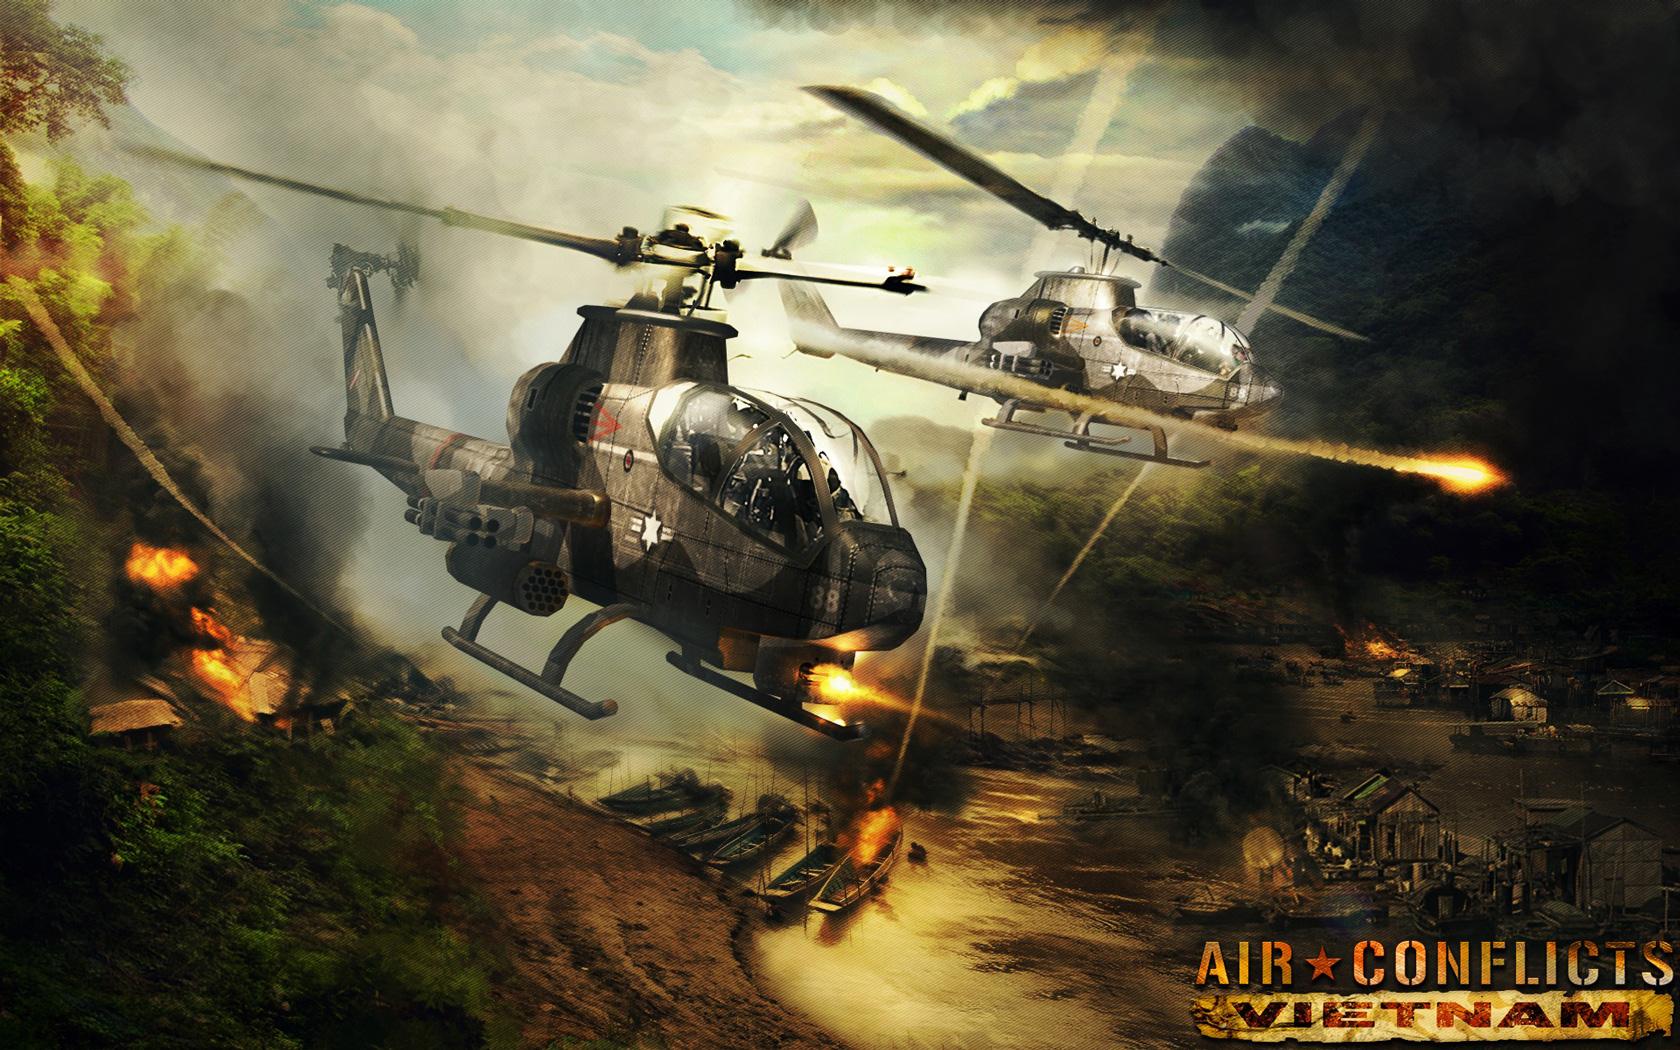 Air Conflicts: Vietnam Wallpaper in 1680x1050